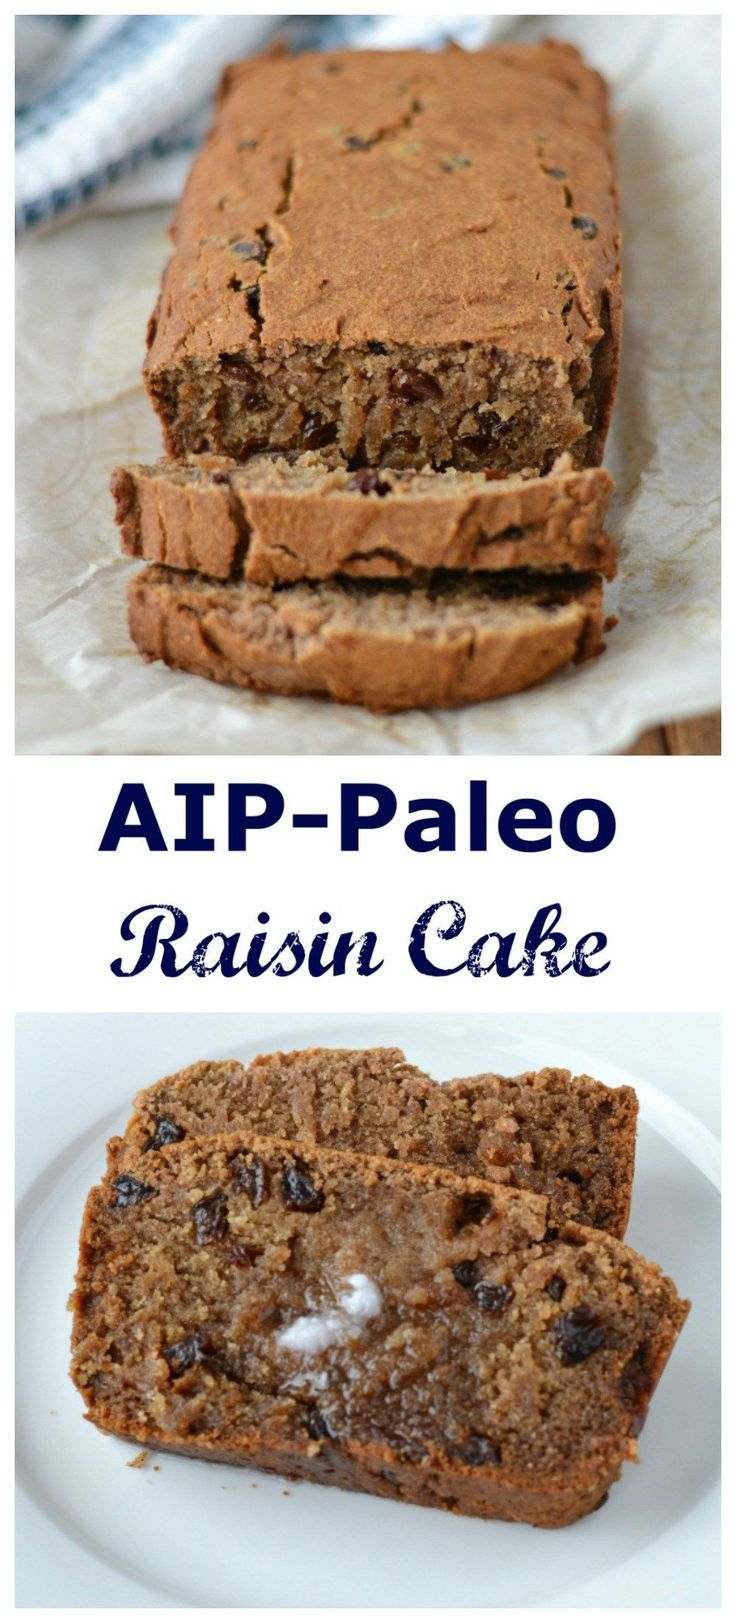 Raisin Cake (AIP/Paleo/Refined Sugar-Free) | Lichen Paleo, Loving AIP